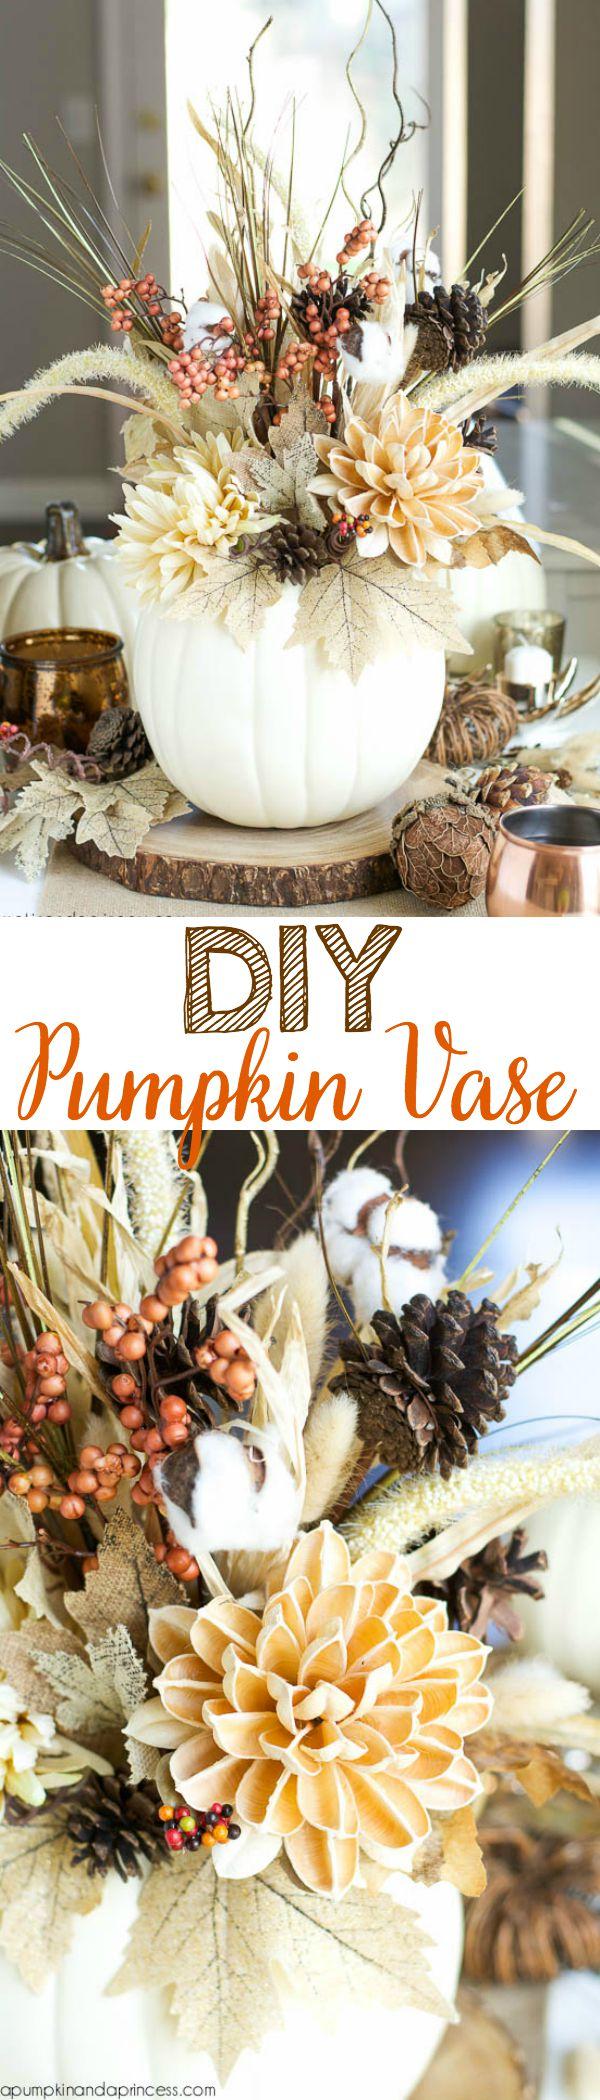 DIY Pumpkin Vase